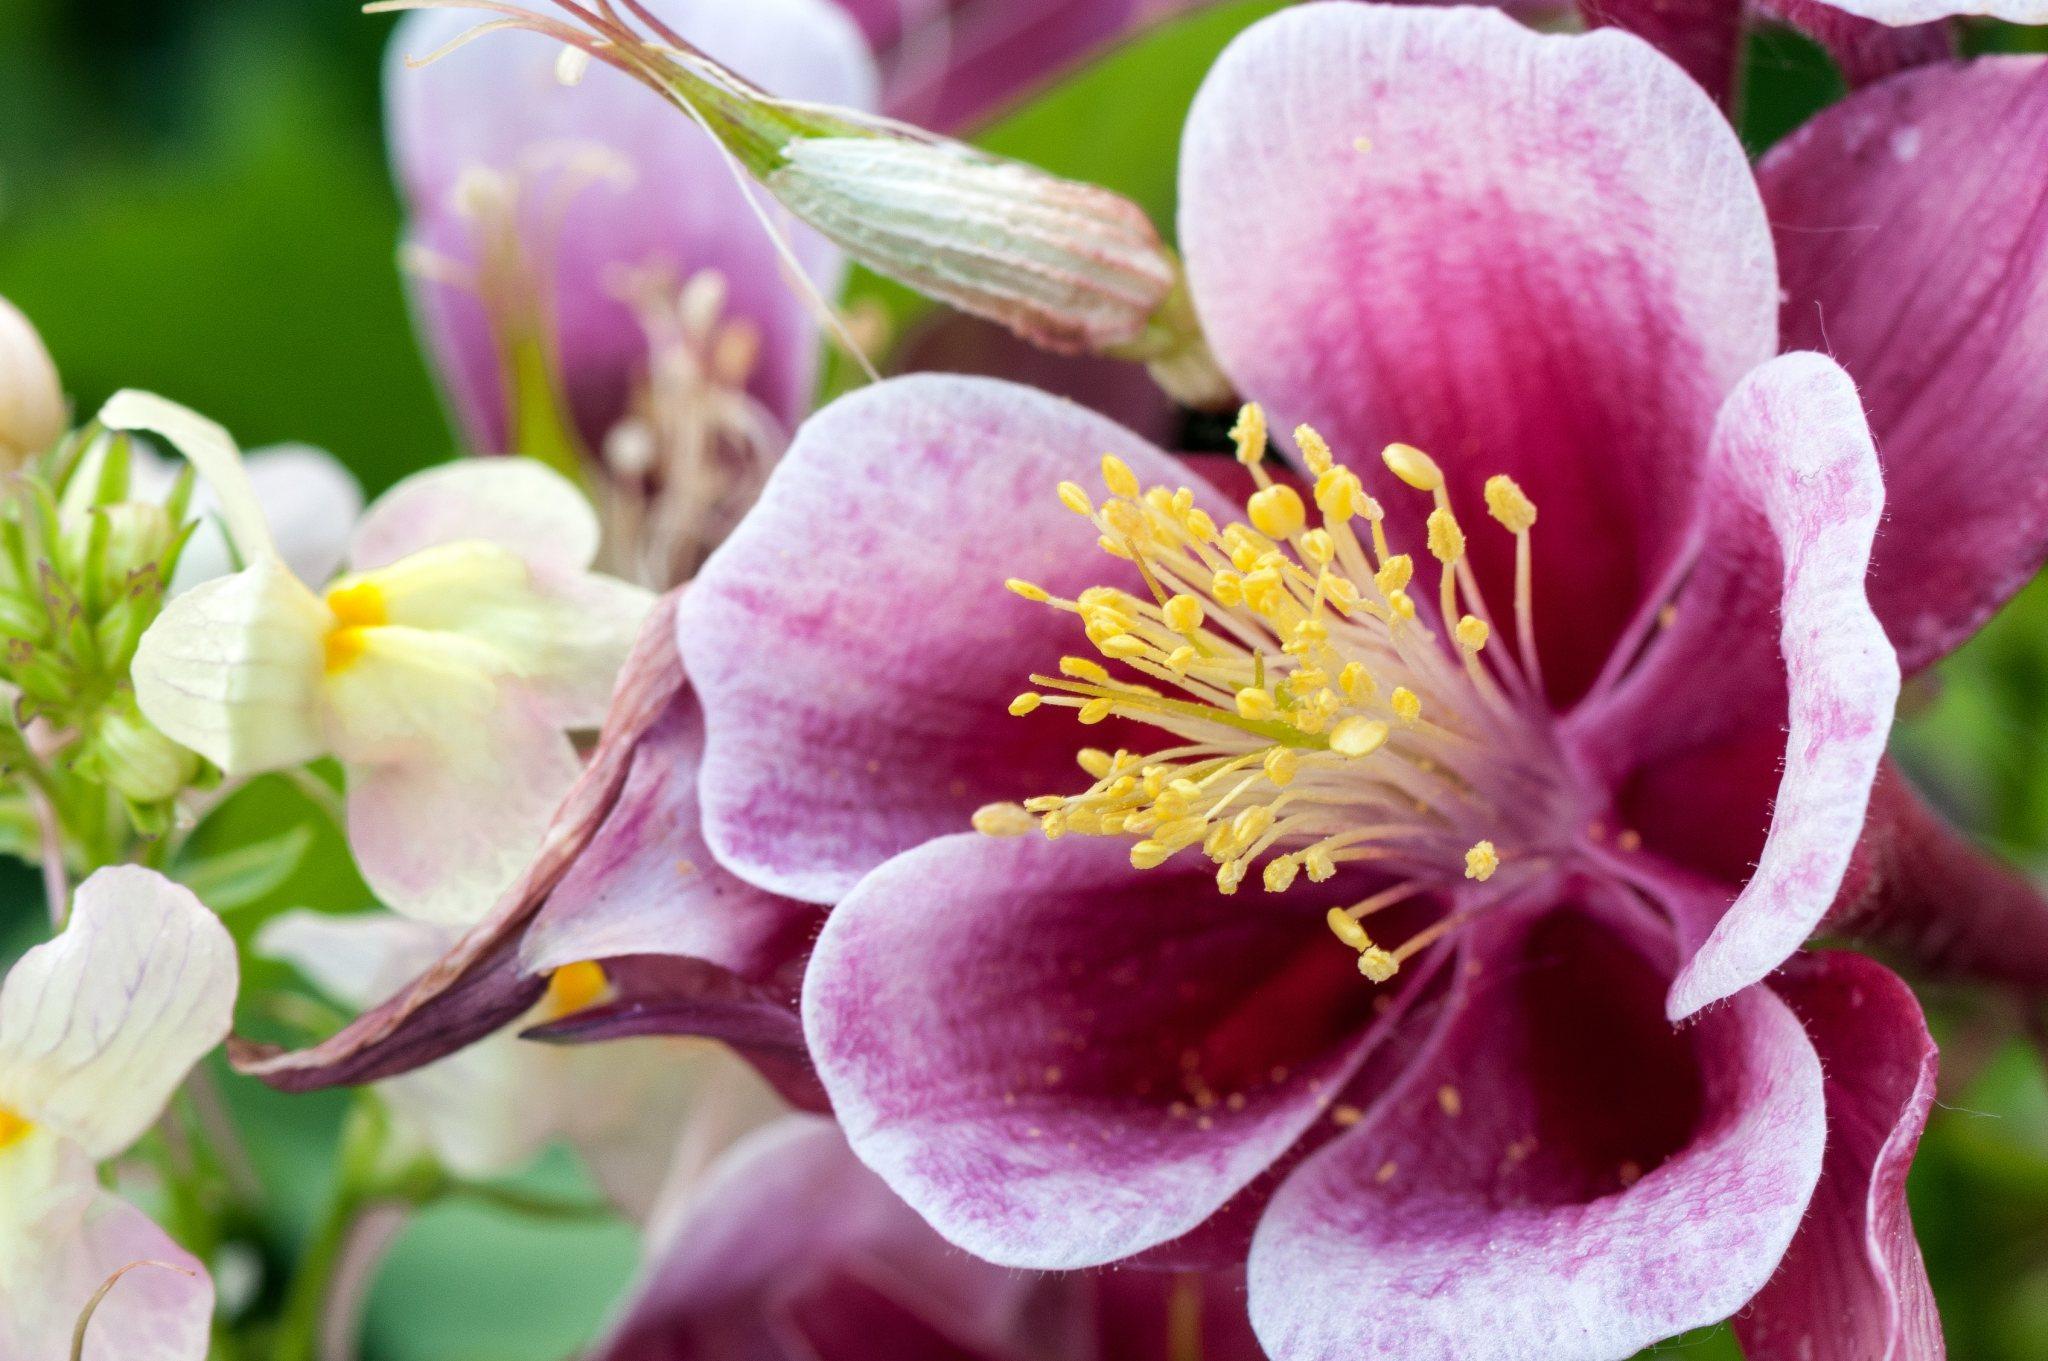 bronces_fleurs-12.jpg